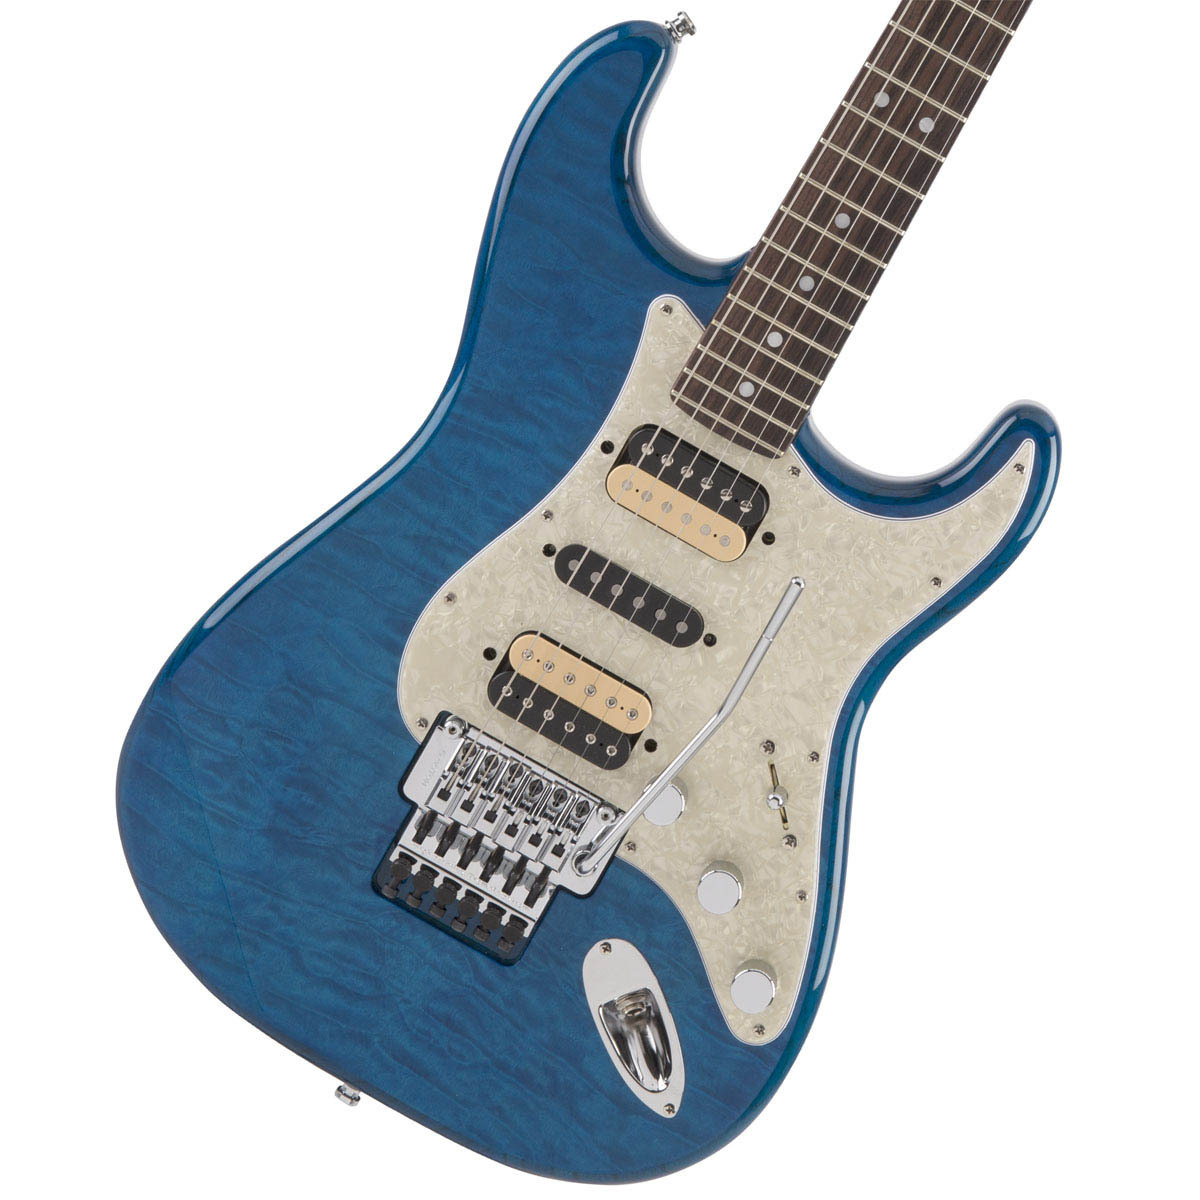 Fender / Michiya Haruhata Stratocaster Caribbean Blue Trans 春畑道哉モデル 【在庫僅少入荷致しました!】【YRK】